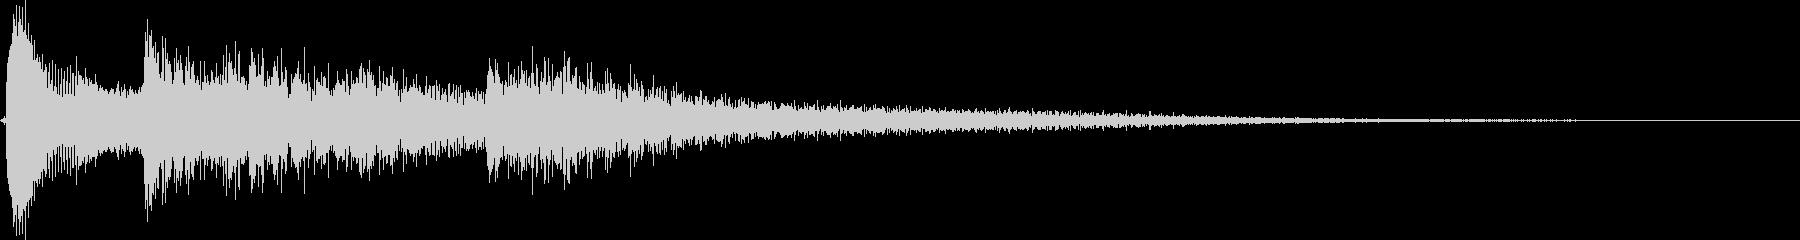 Raw guitar, slightly depressed and sad jingle's unreproduced waveform